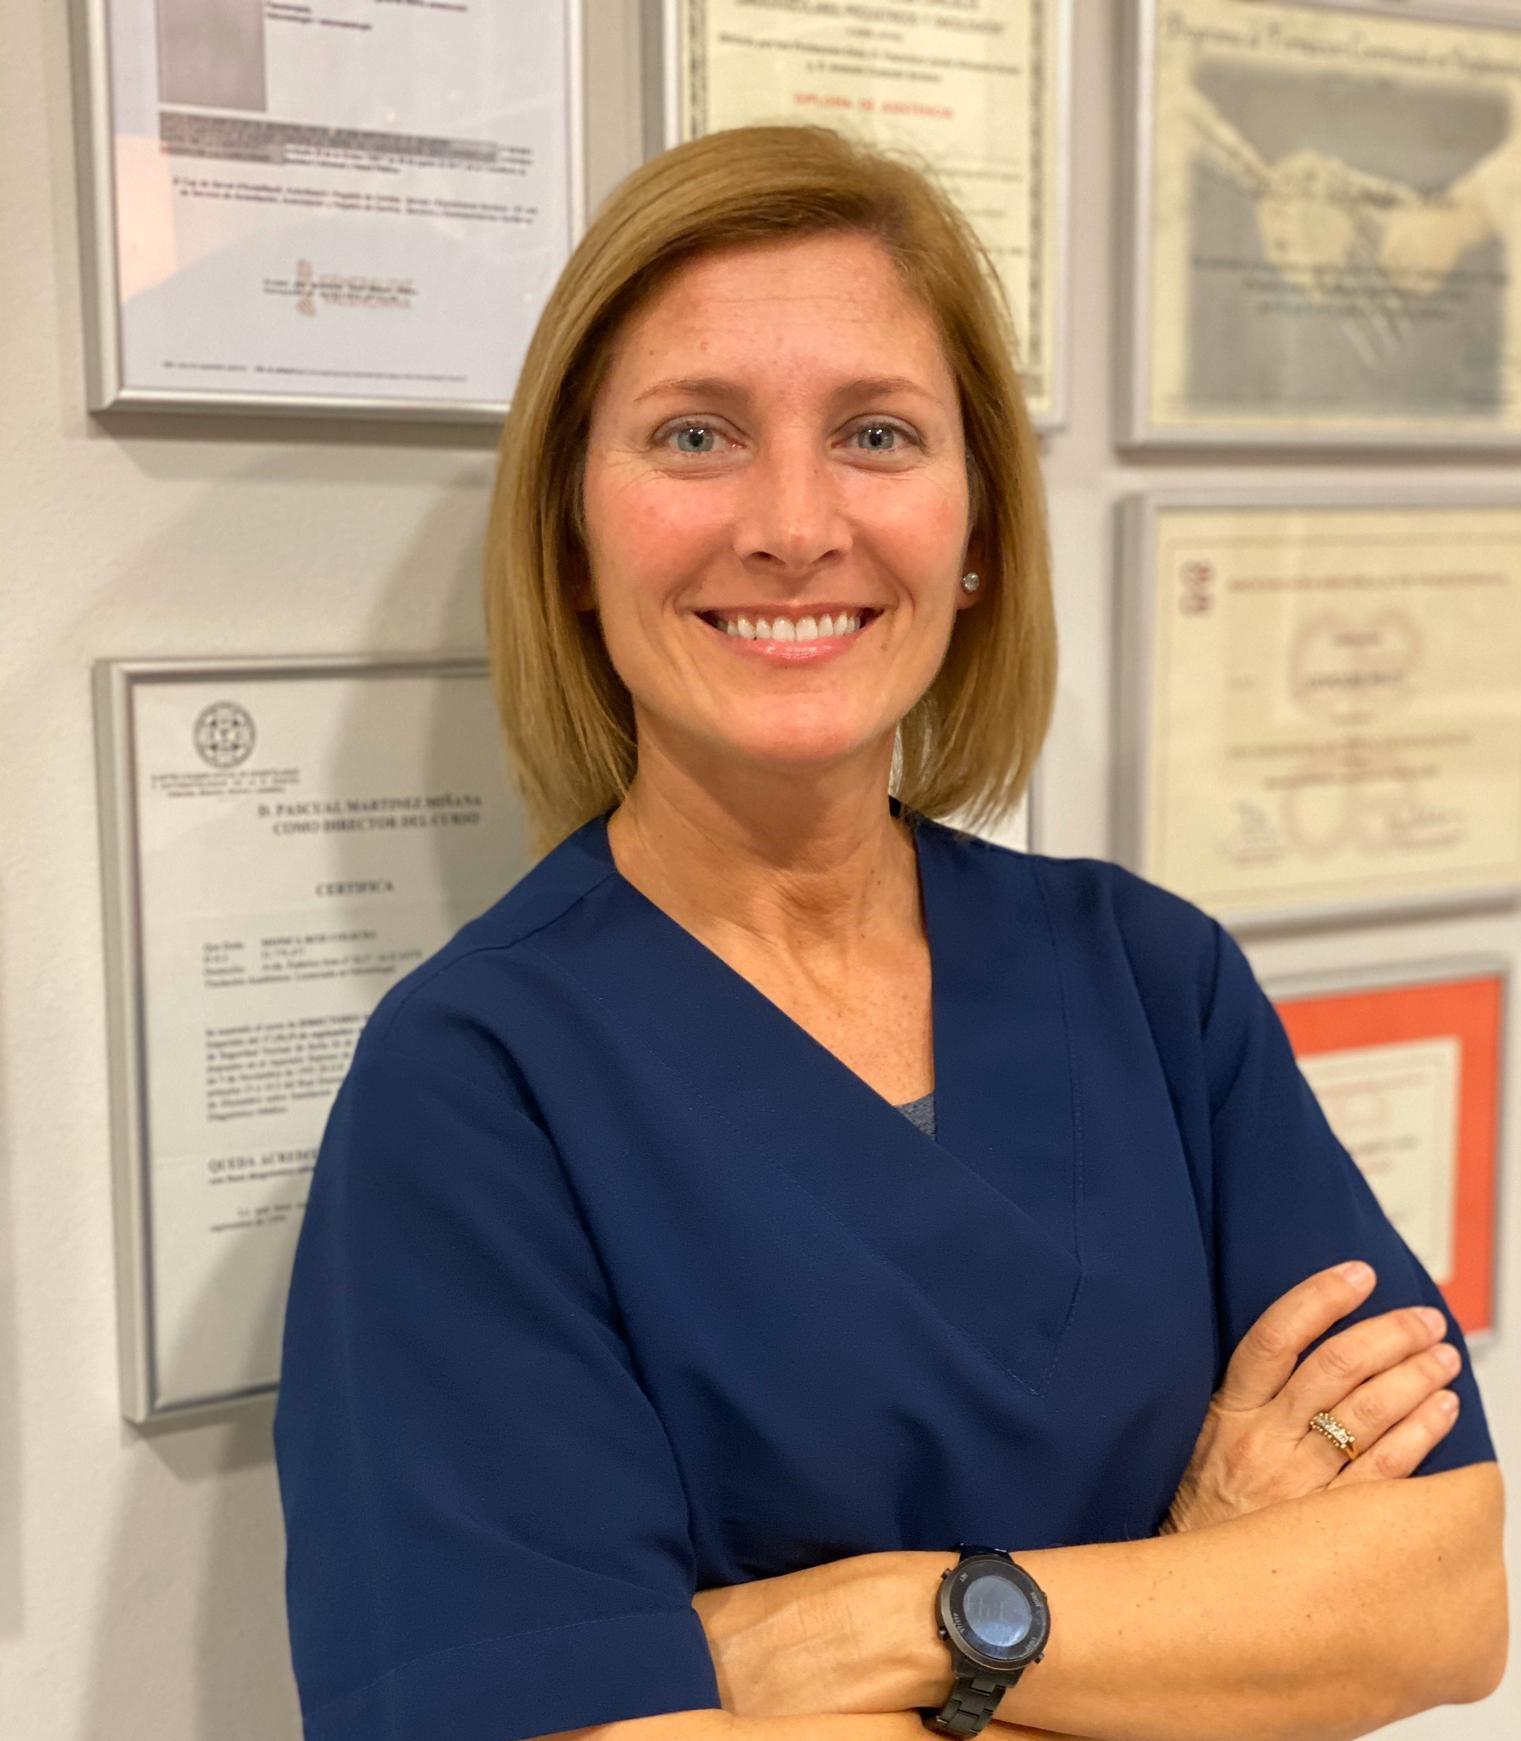 Dra. Mónica Ruiz Colechá